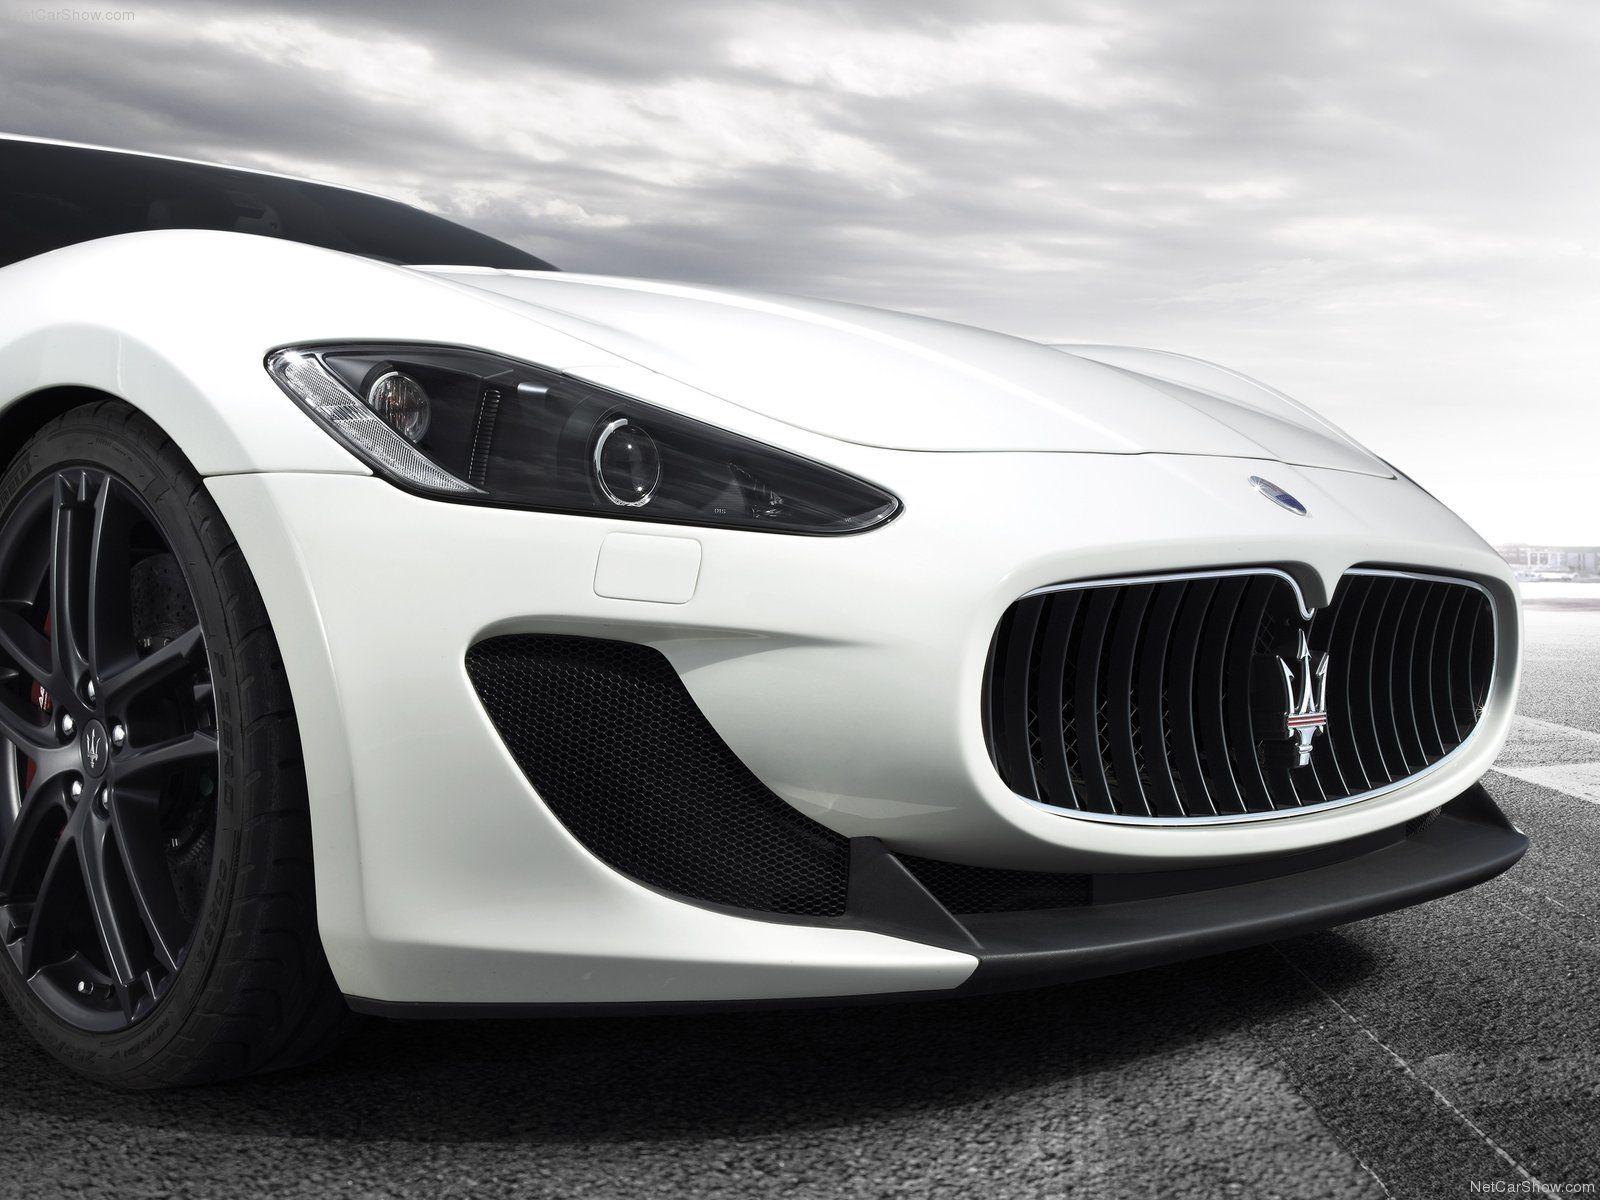 Maserati-GranTurismo MC Stradale 2012 | Vvrrrooommmm | Pinterest ...